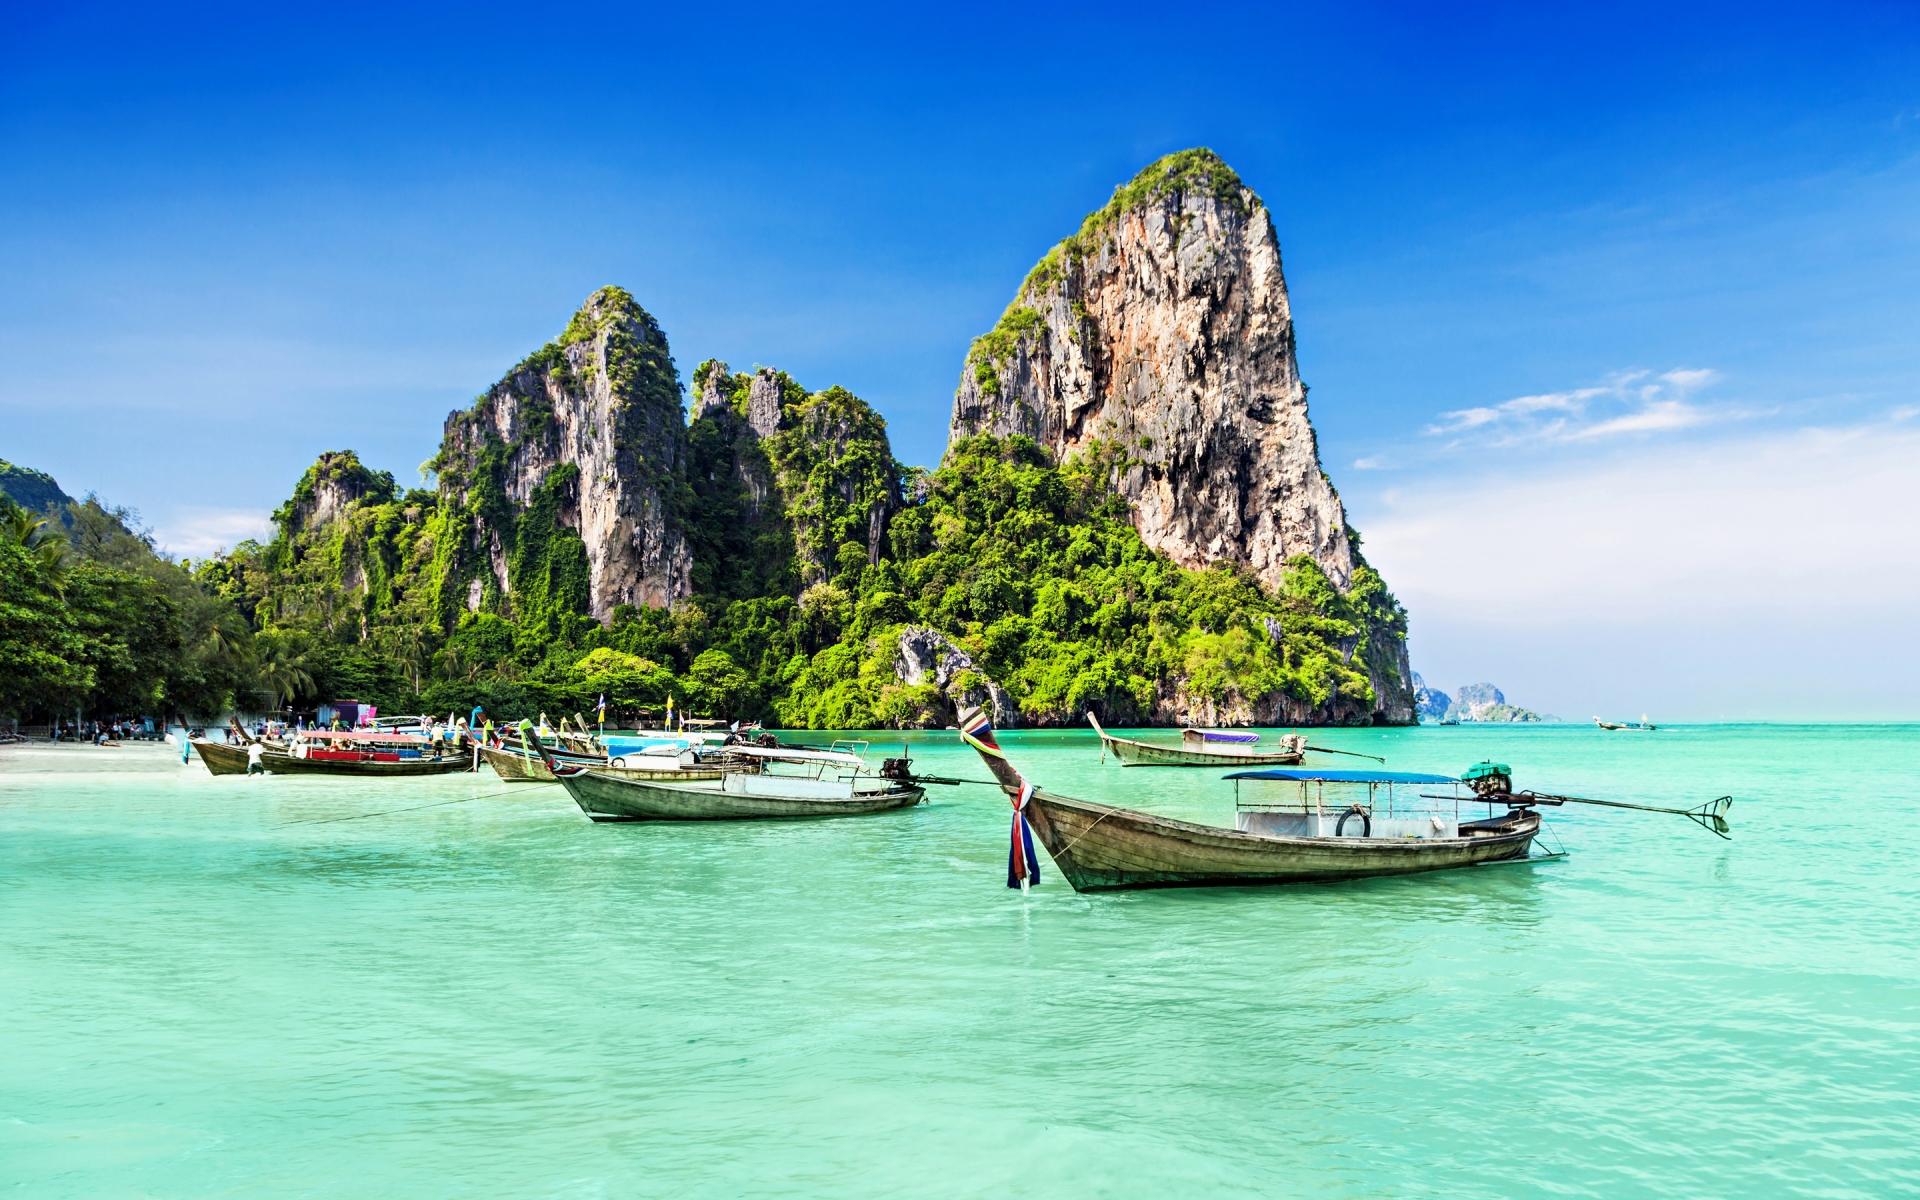 Phuket Thailand for 1920 x 1200 widescreen resolution 1920x1200